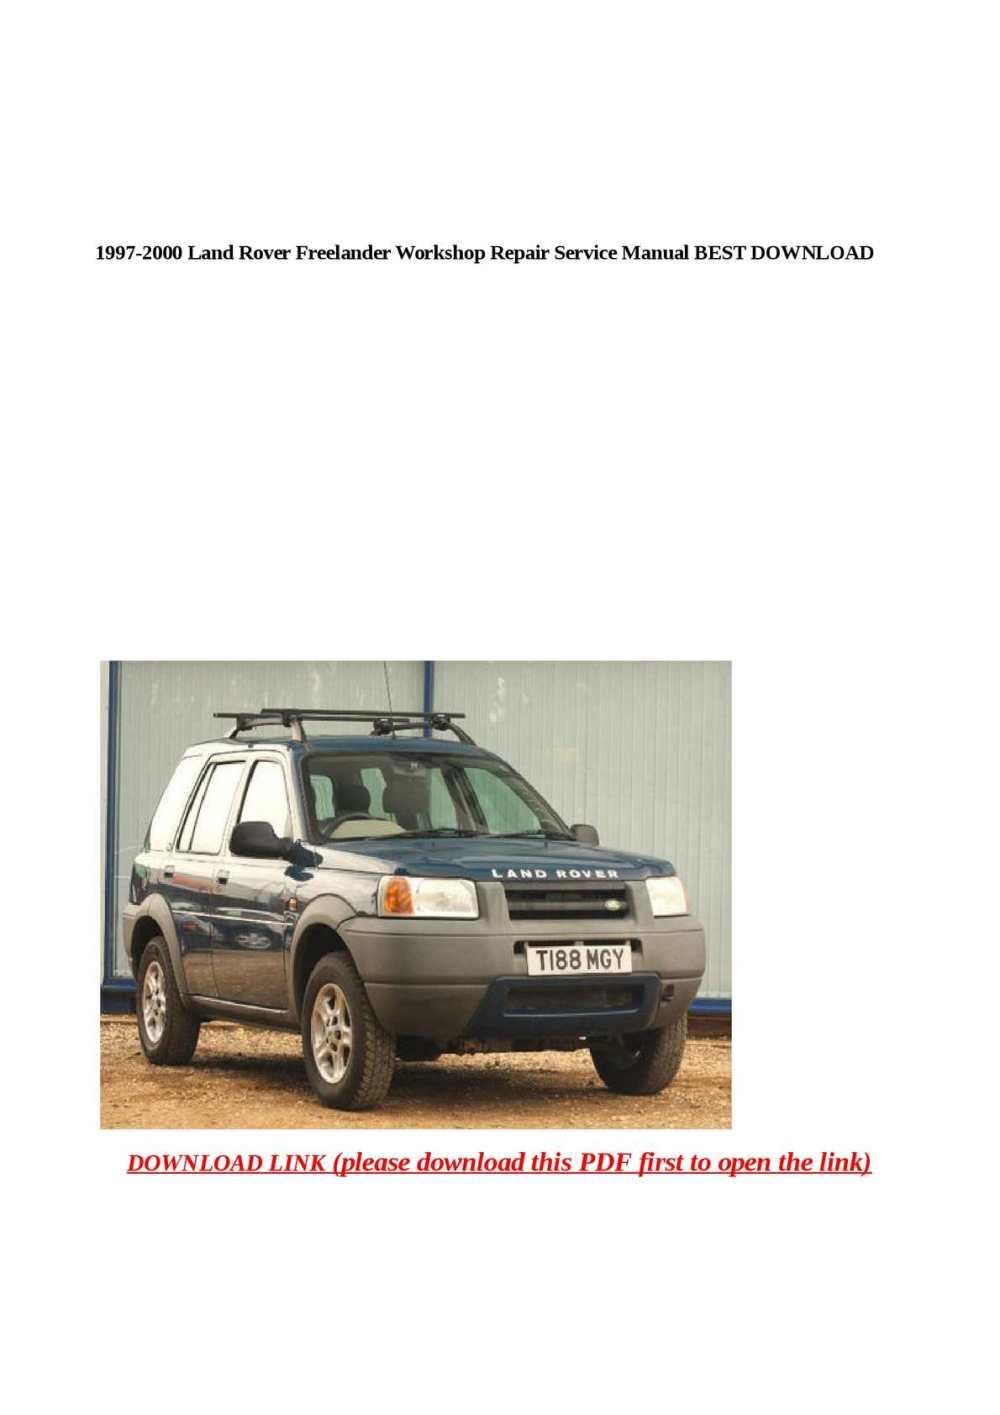 medium resolution of calam o 1997 2000 land rover freelander workshop repair service manual best download